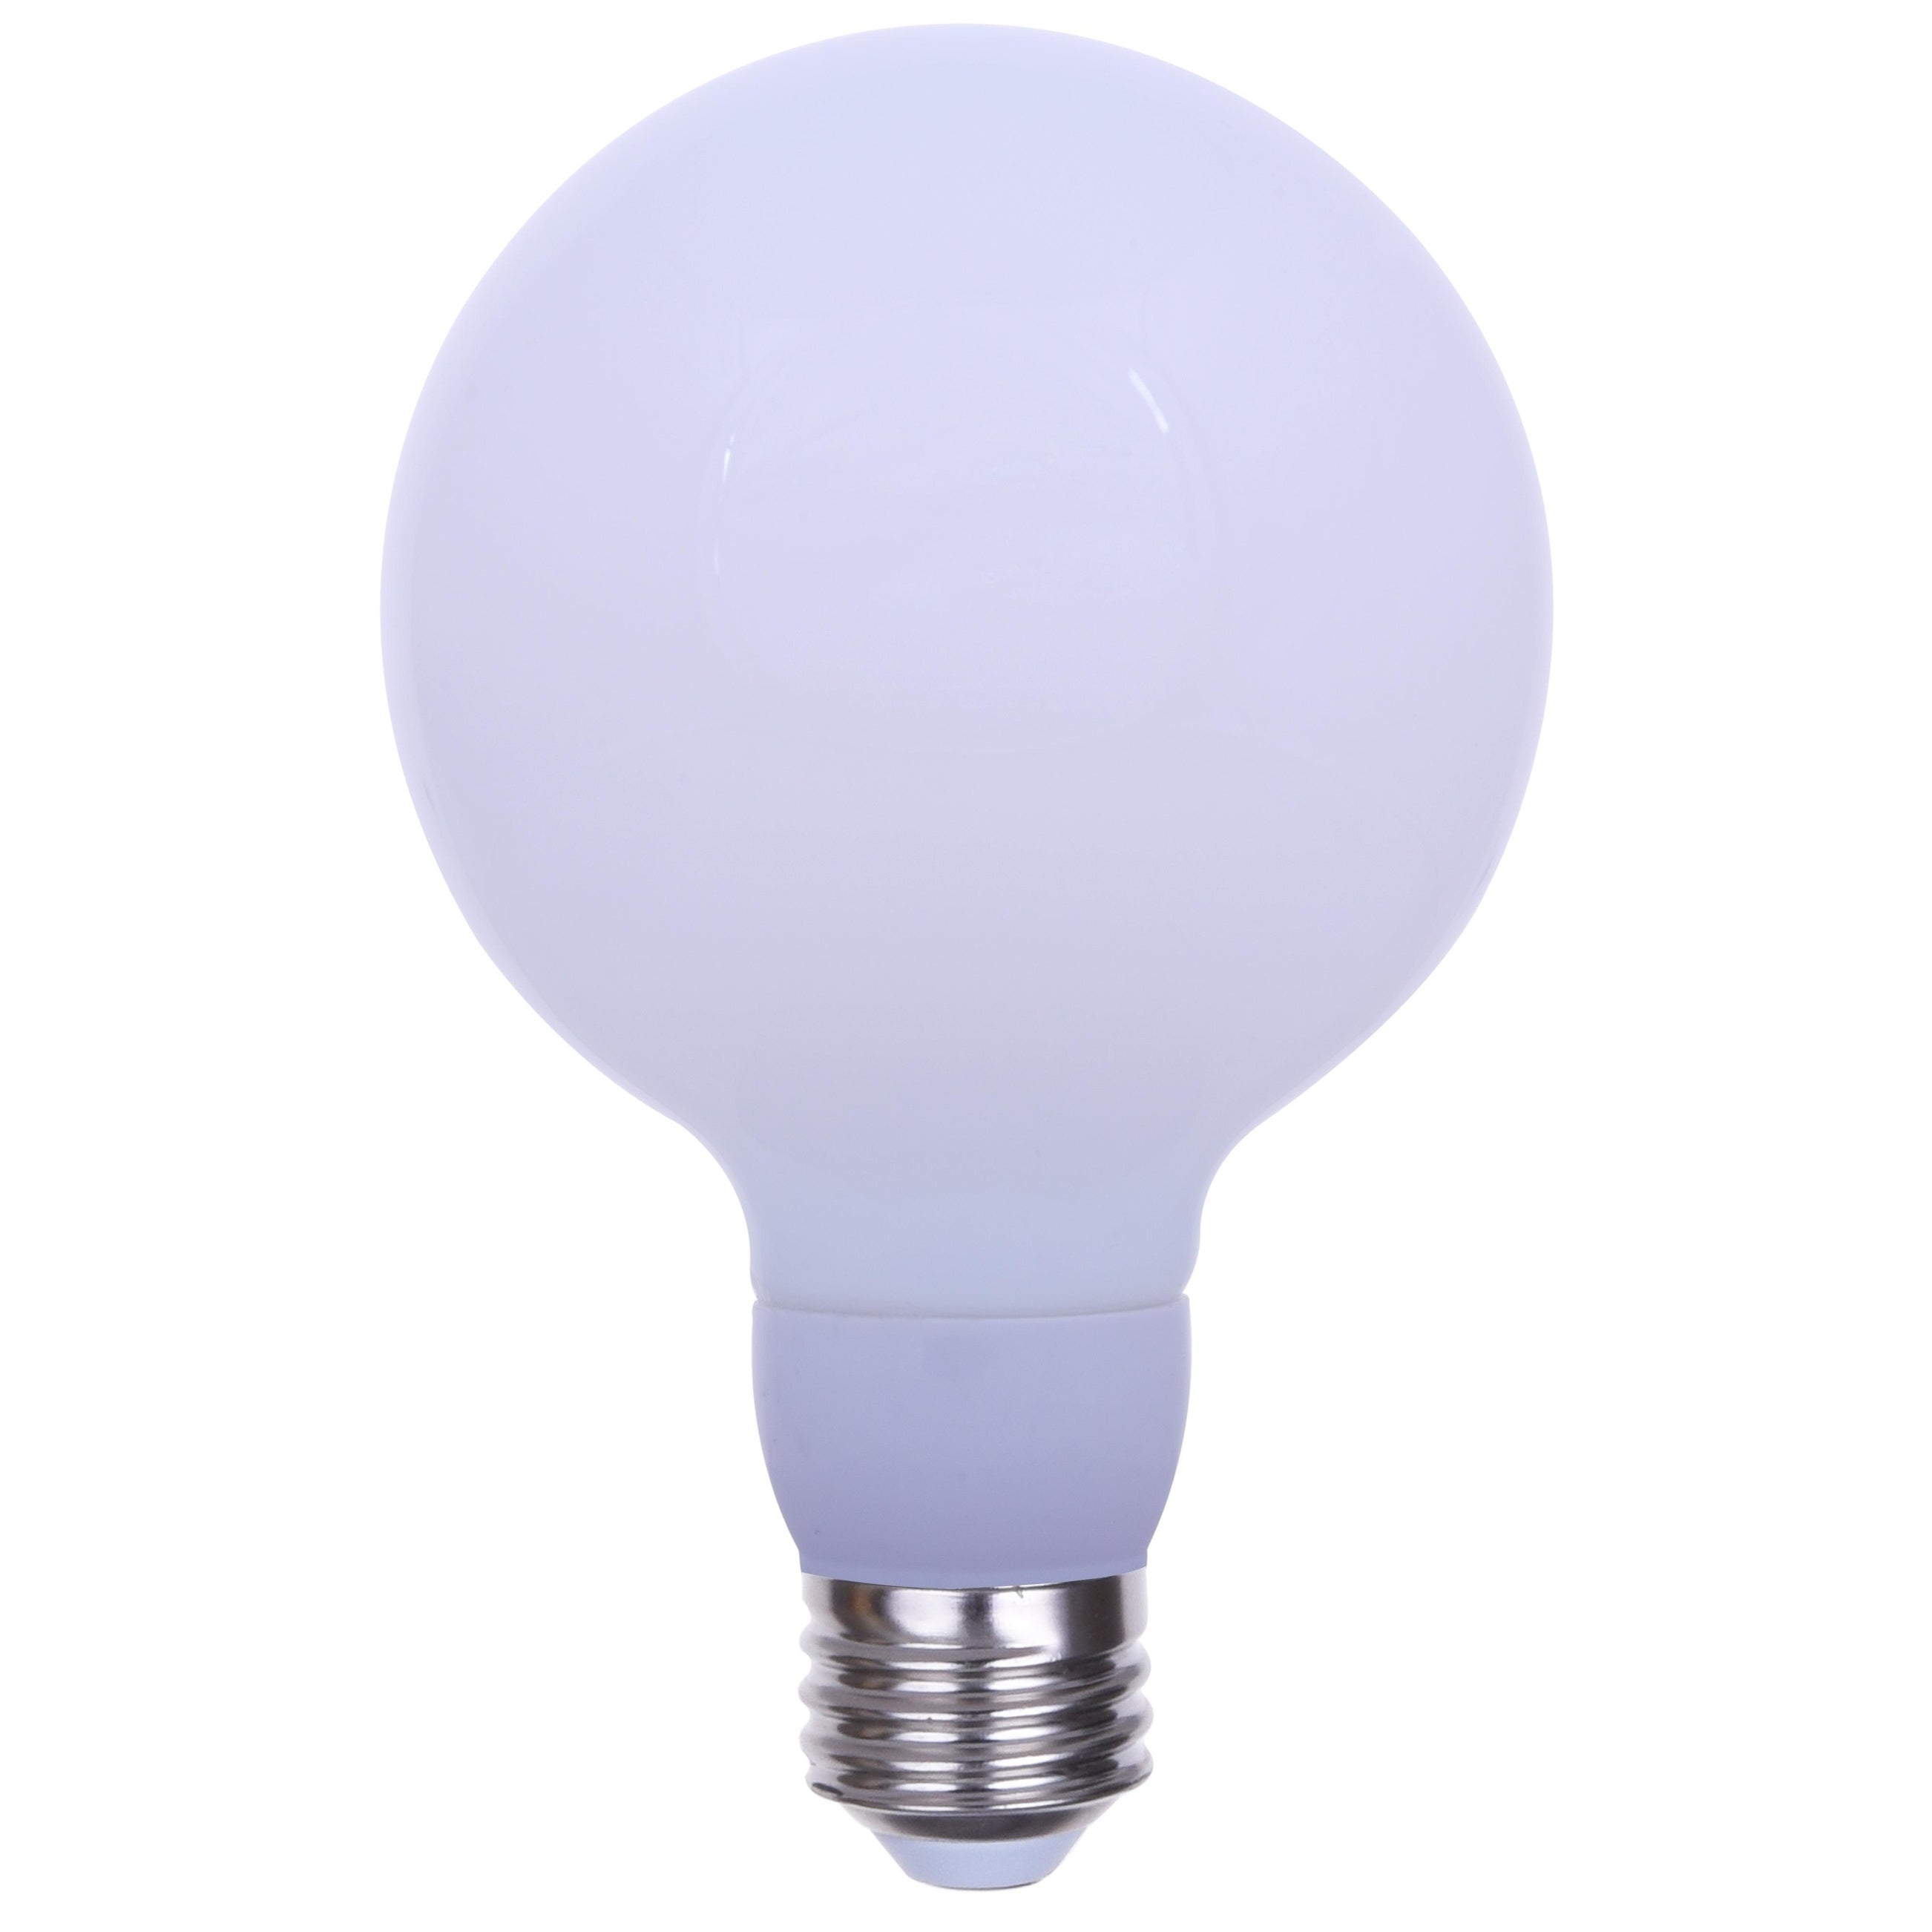 3 Pack G30 Led Edison Globe Light Bulb 15w 100 Watt Equivalent 1600 Lumens Frosted E26 Base Dimmable